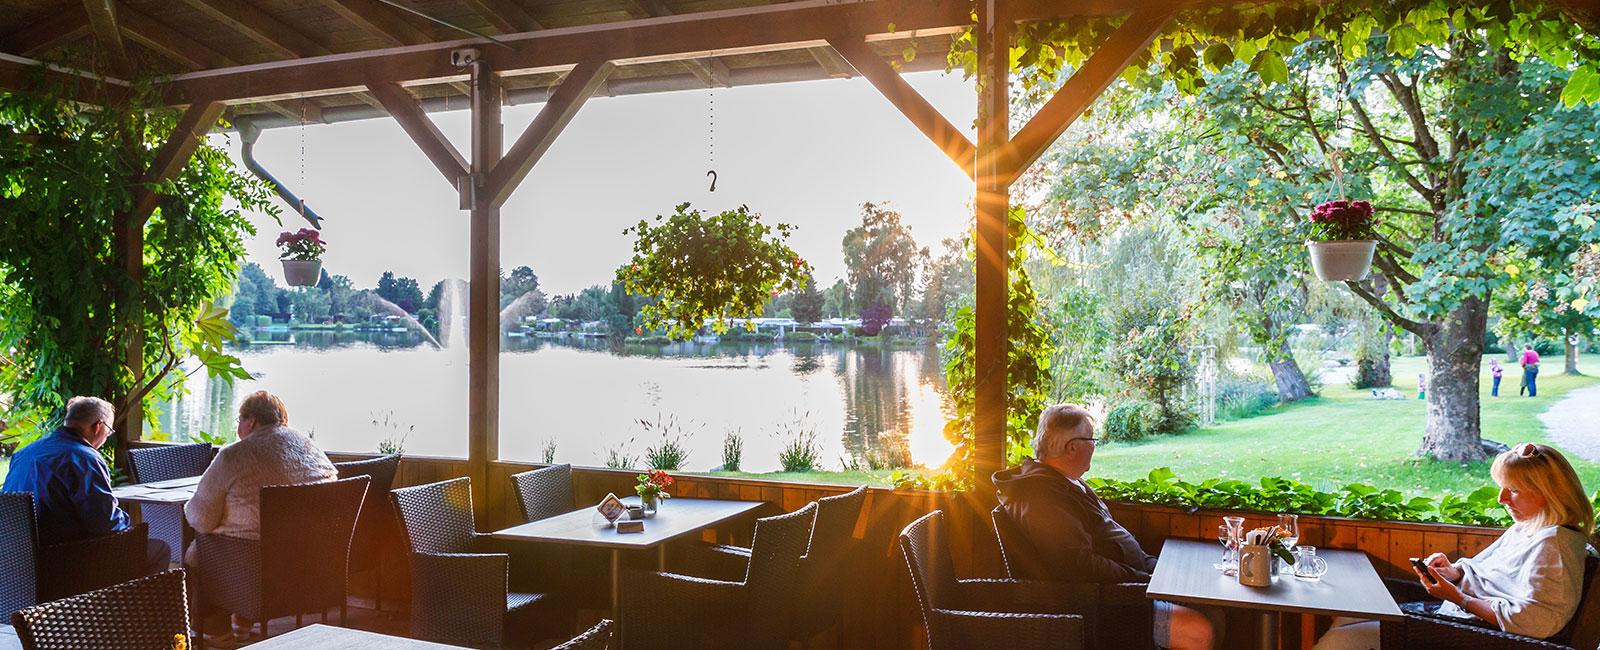 Restaurant Campingplatz in Bayern